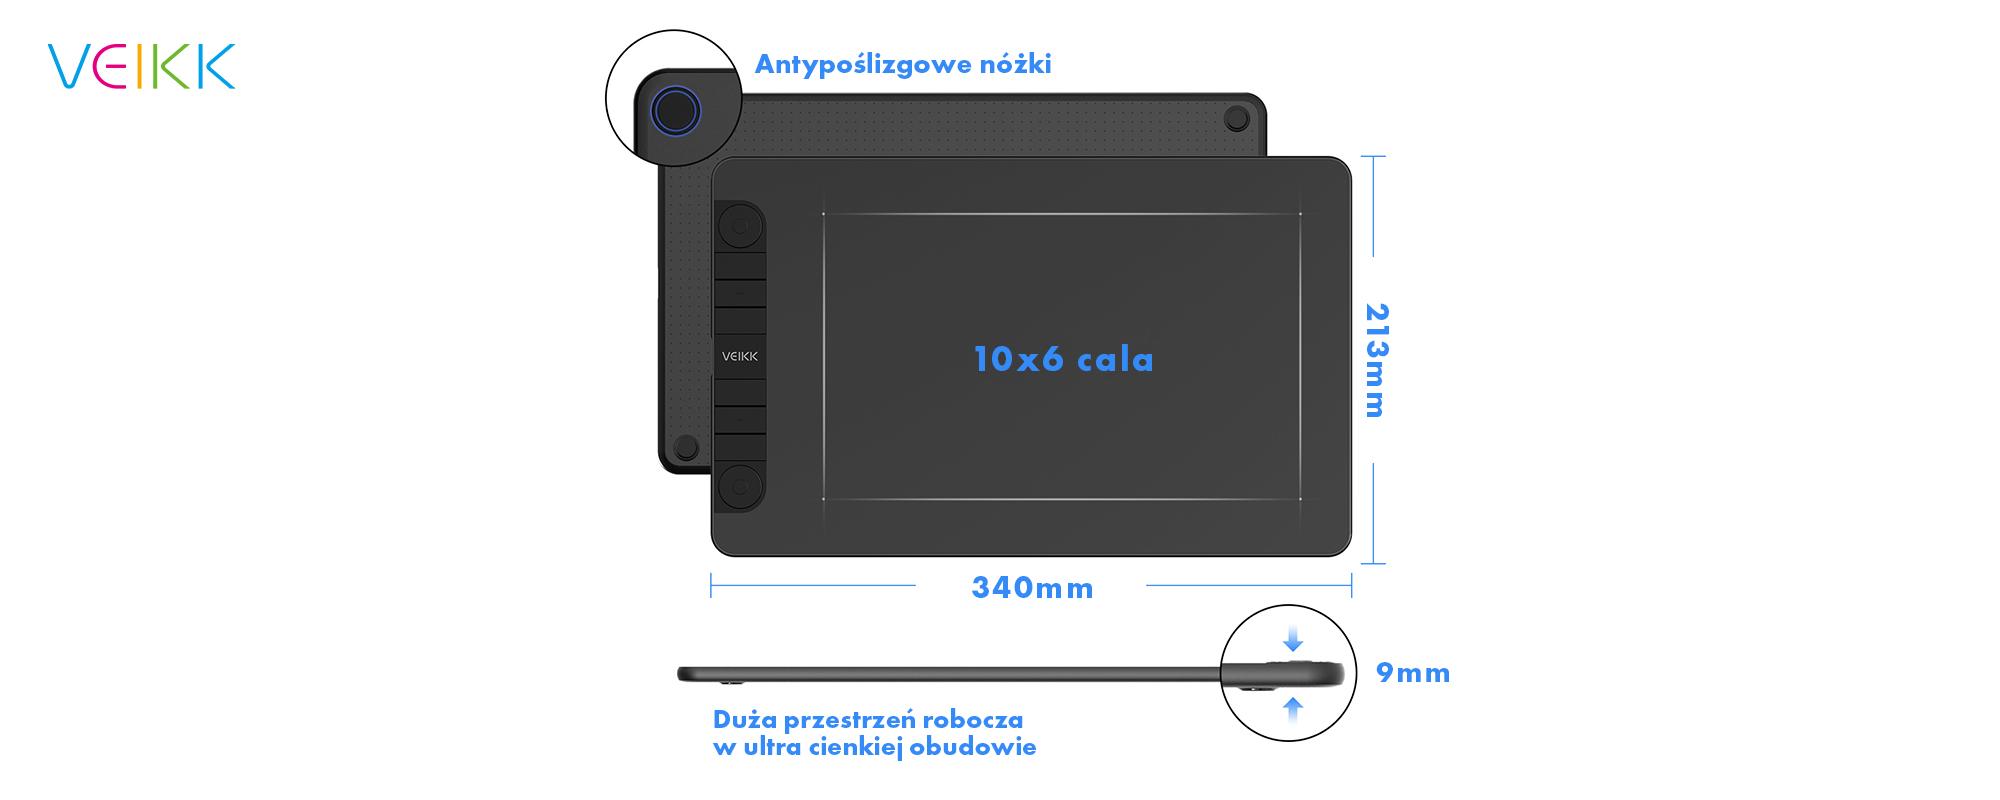 Tablet graficzny Veikk VK1060 Pro - antypoślizgowe nóżki